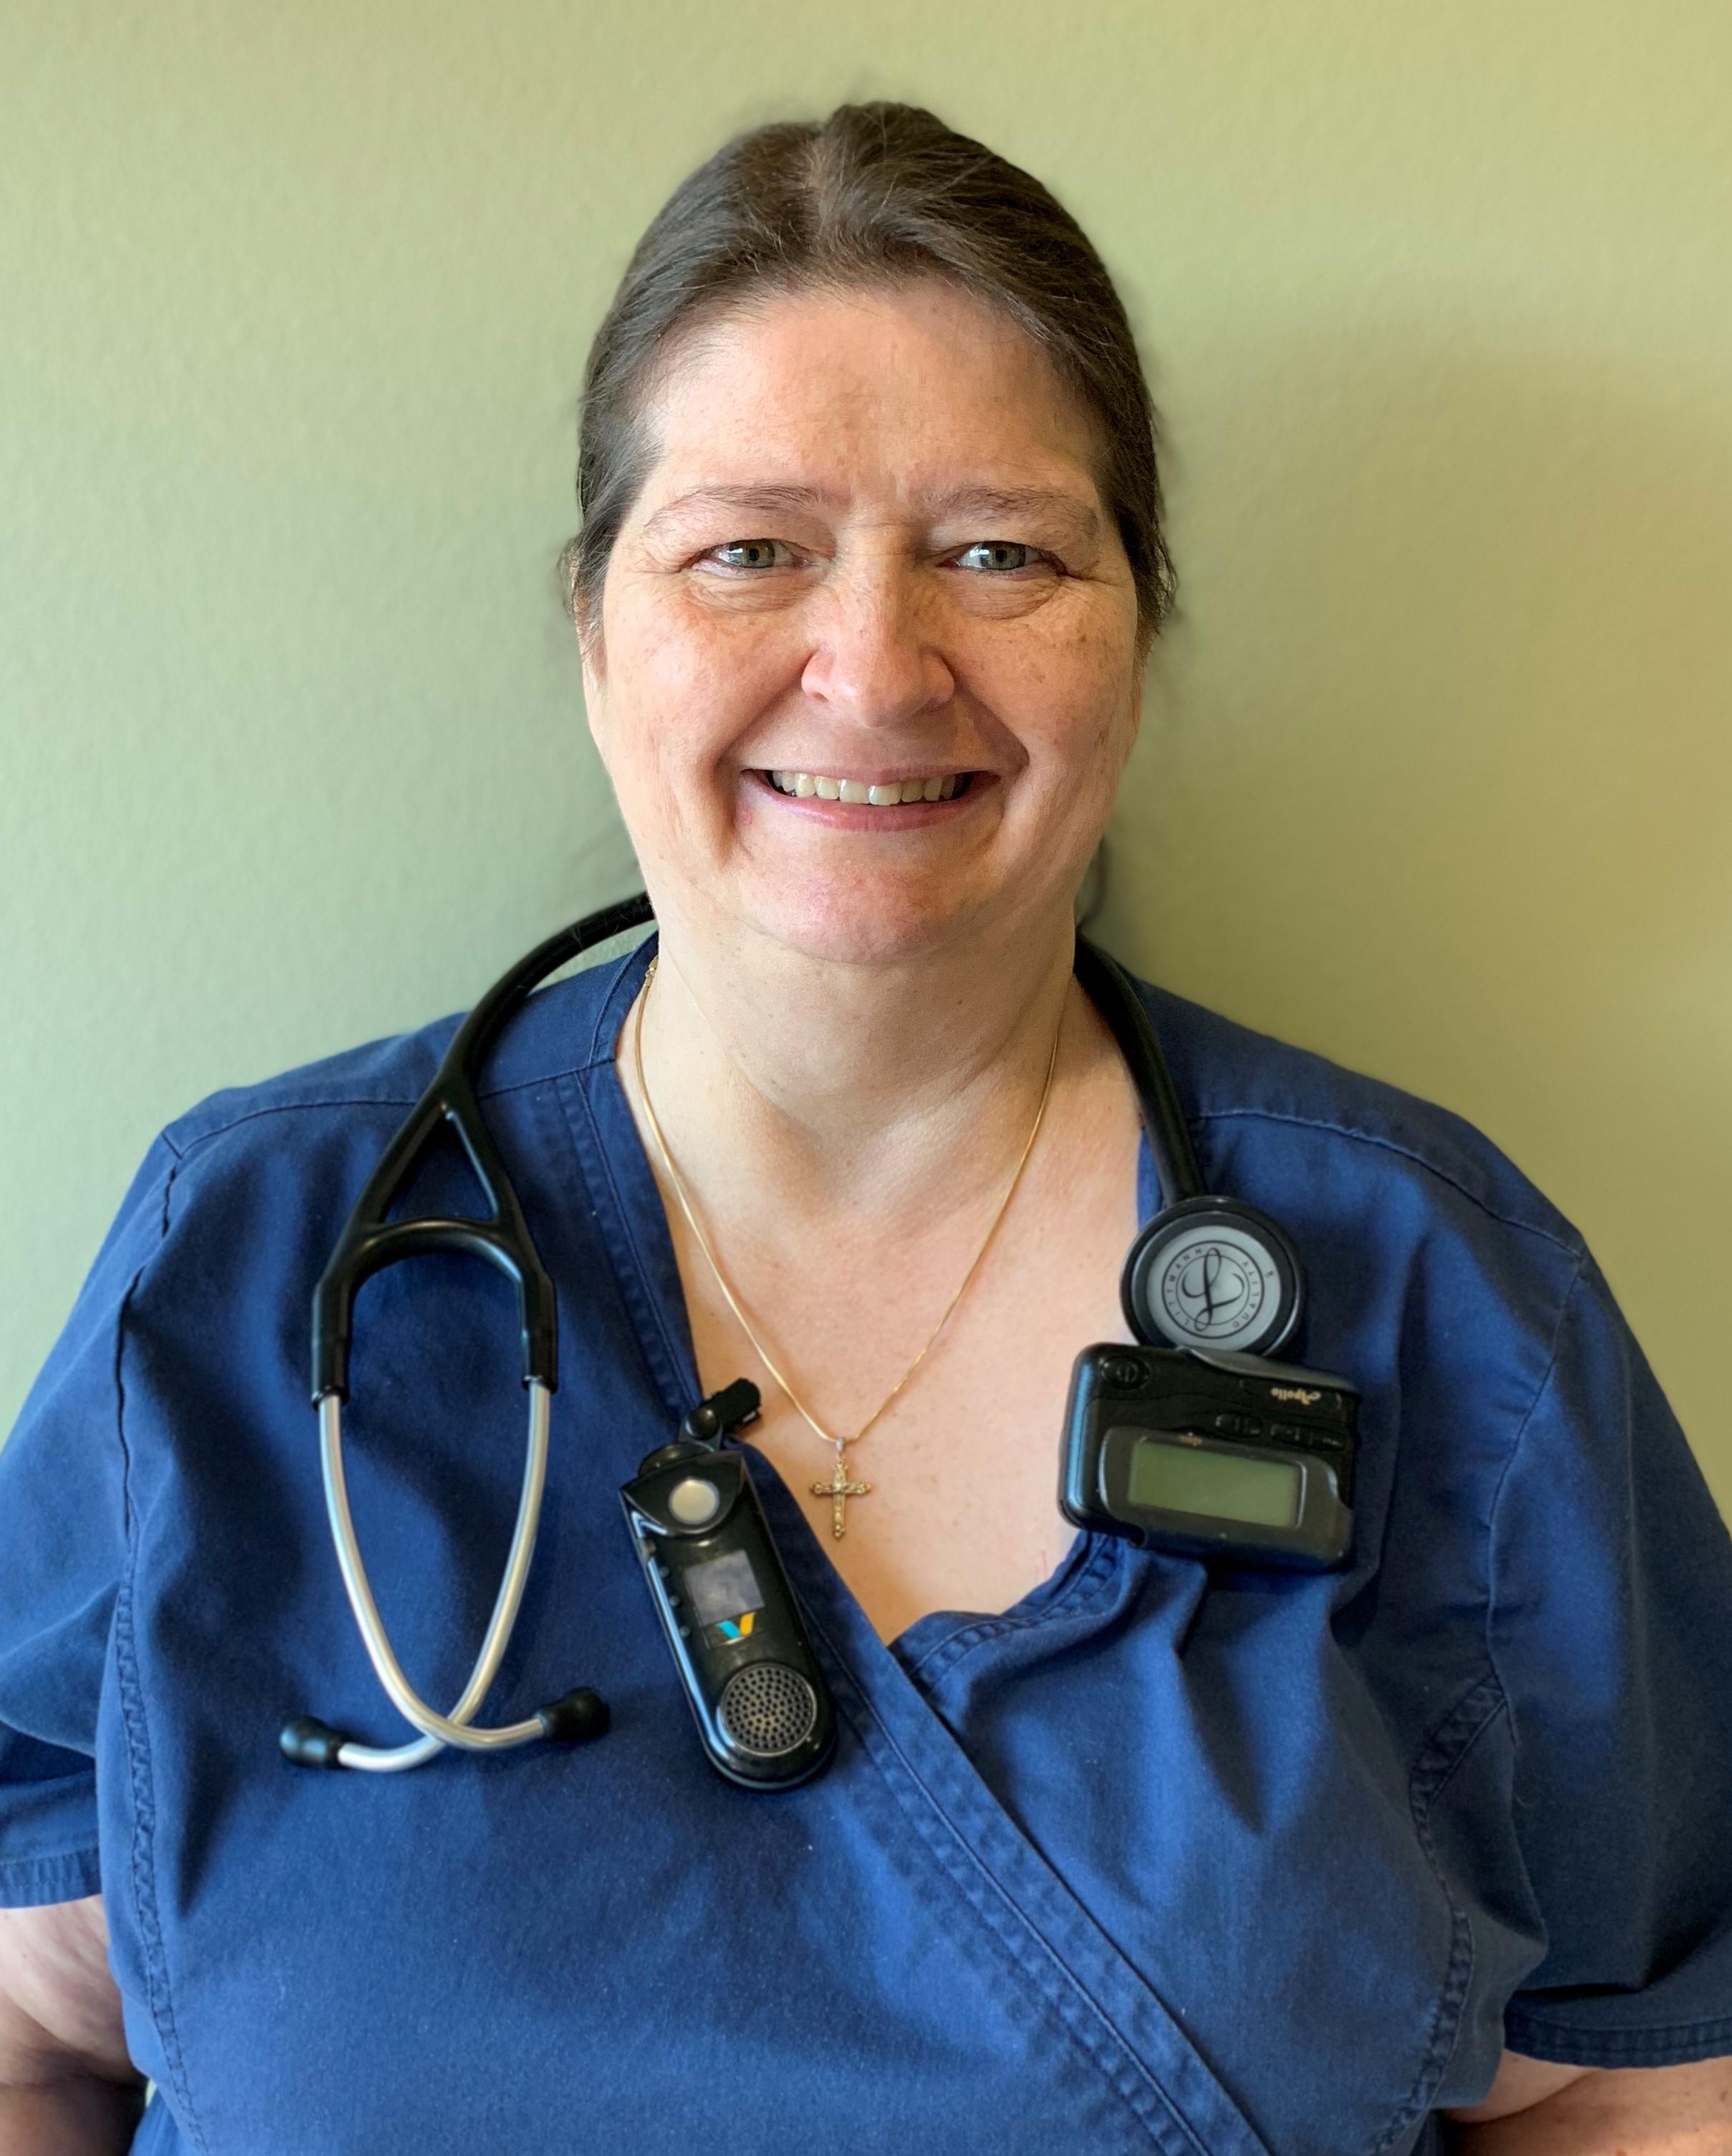 Breedlove Achieves Critical Care Nursing Certification